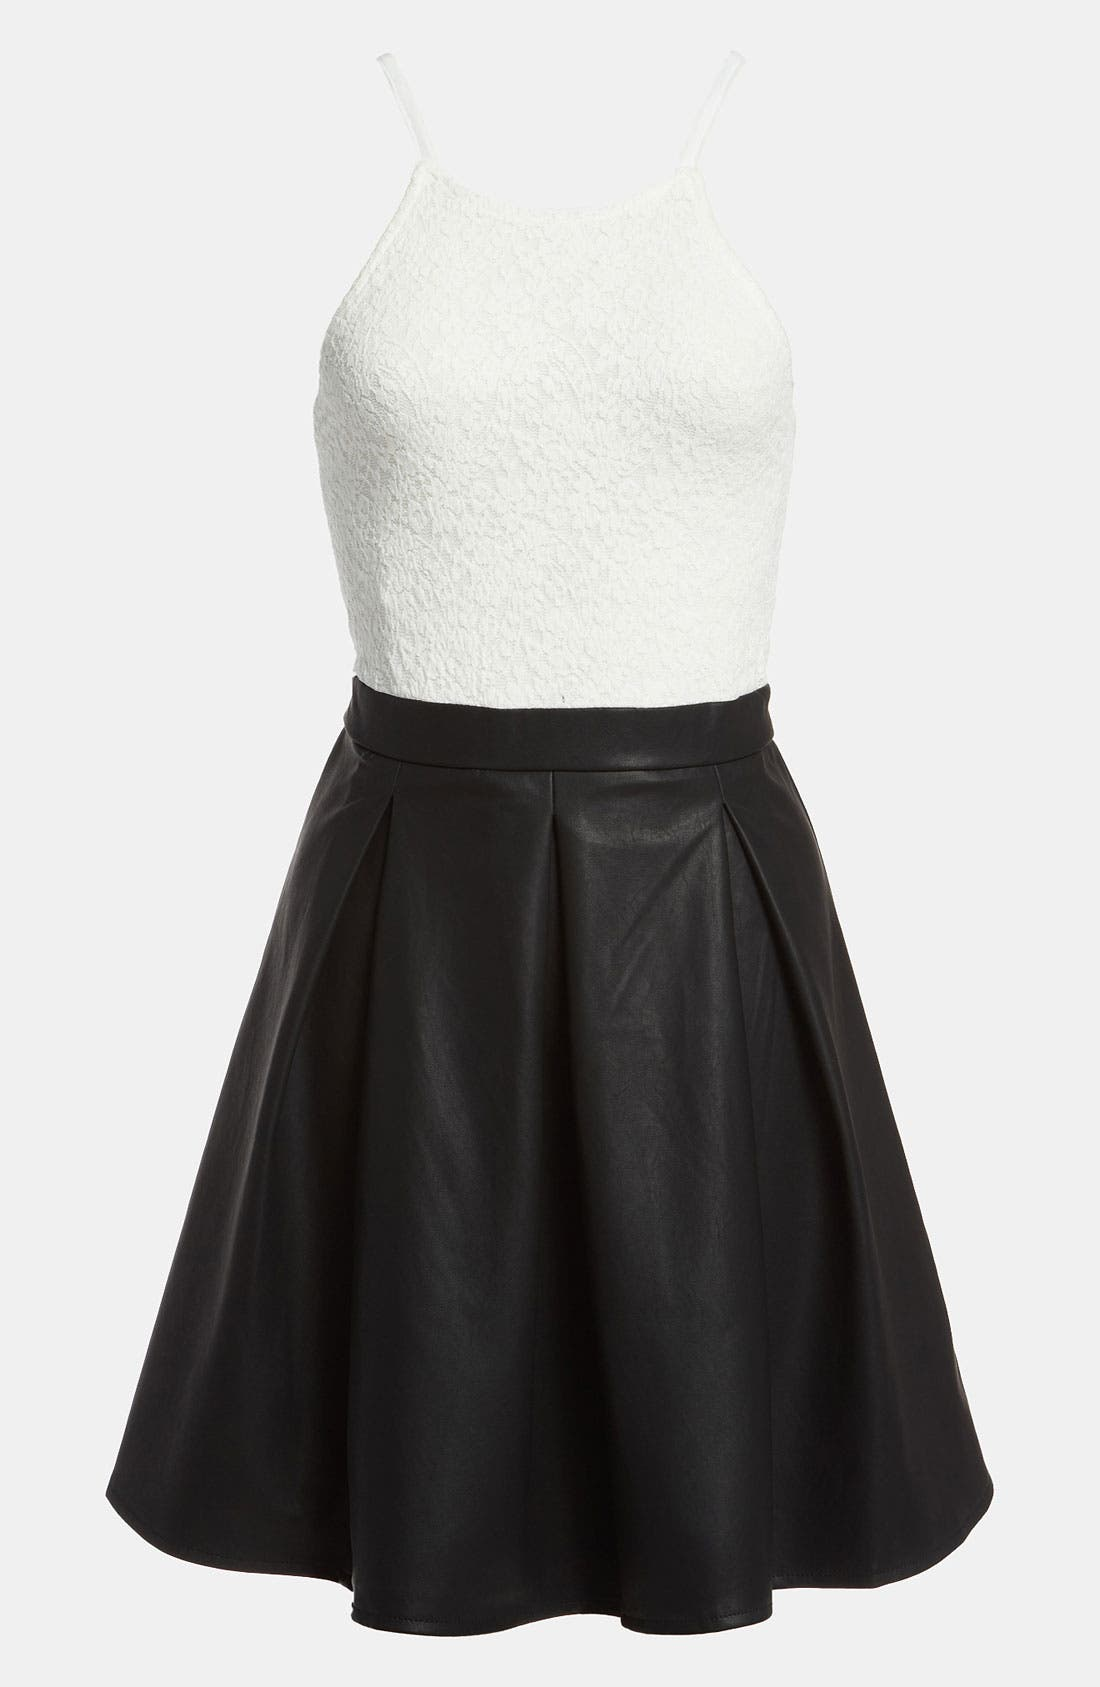 Main Image - MINKPINK 'Imogen' Combo Dress